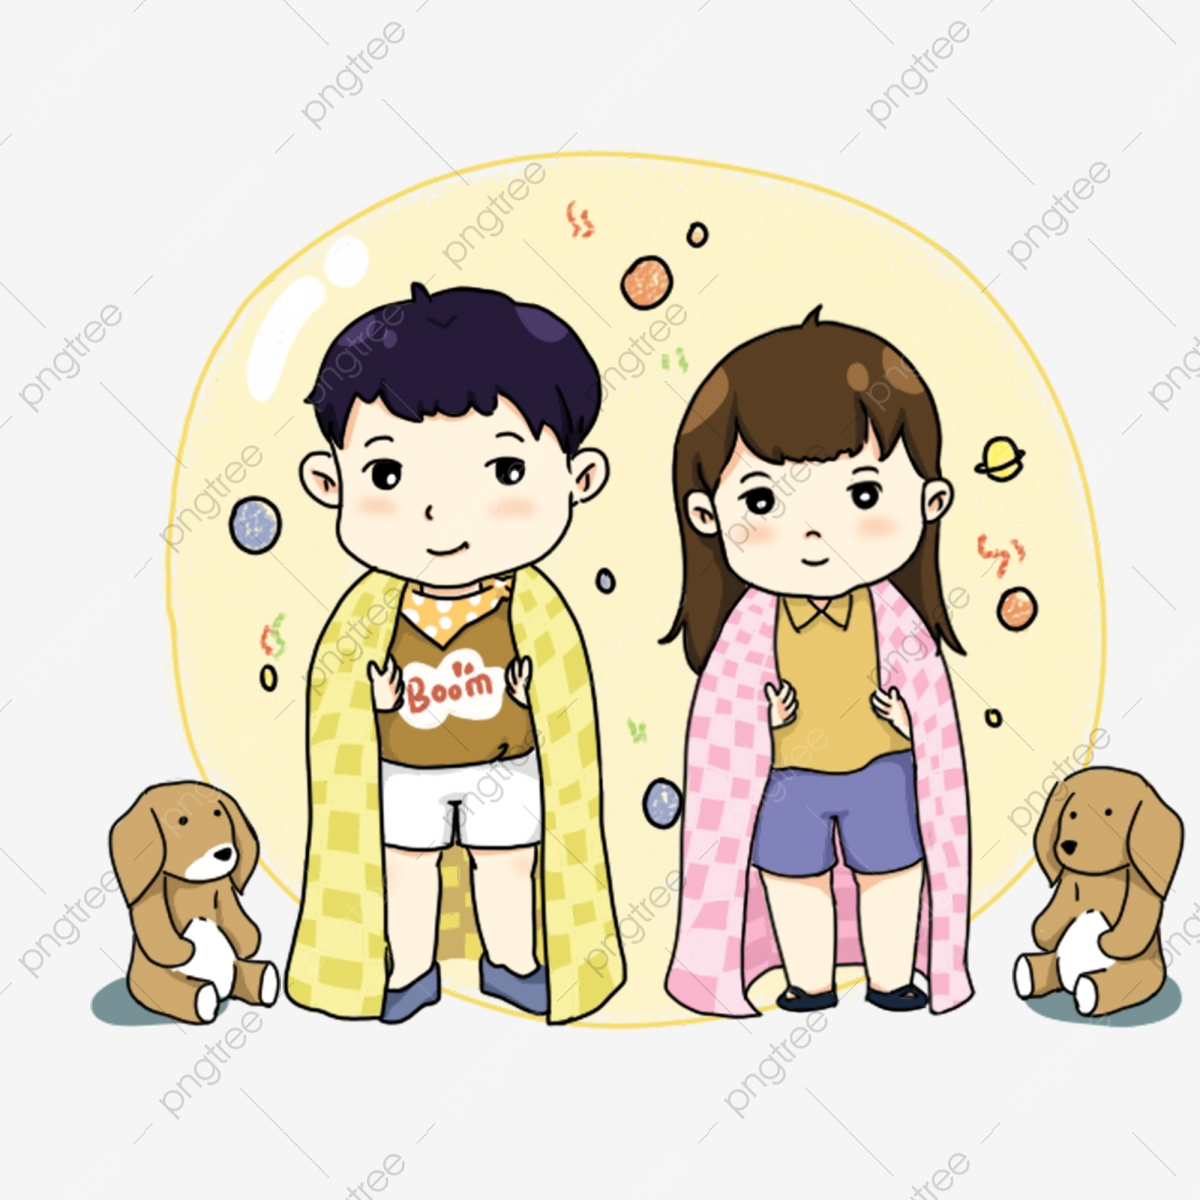 Child Safety Home Stock Illustrations – 3,702 Child Safety Home Stock  Illustrations, Vectors & Clipart - Dreamstime